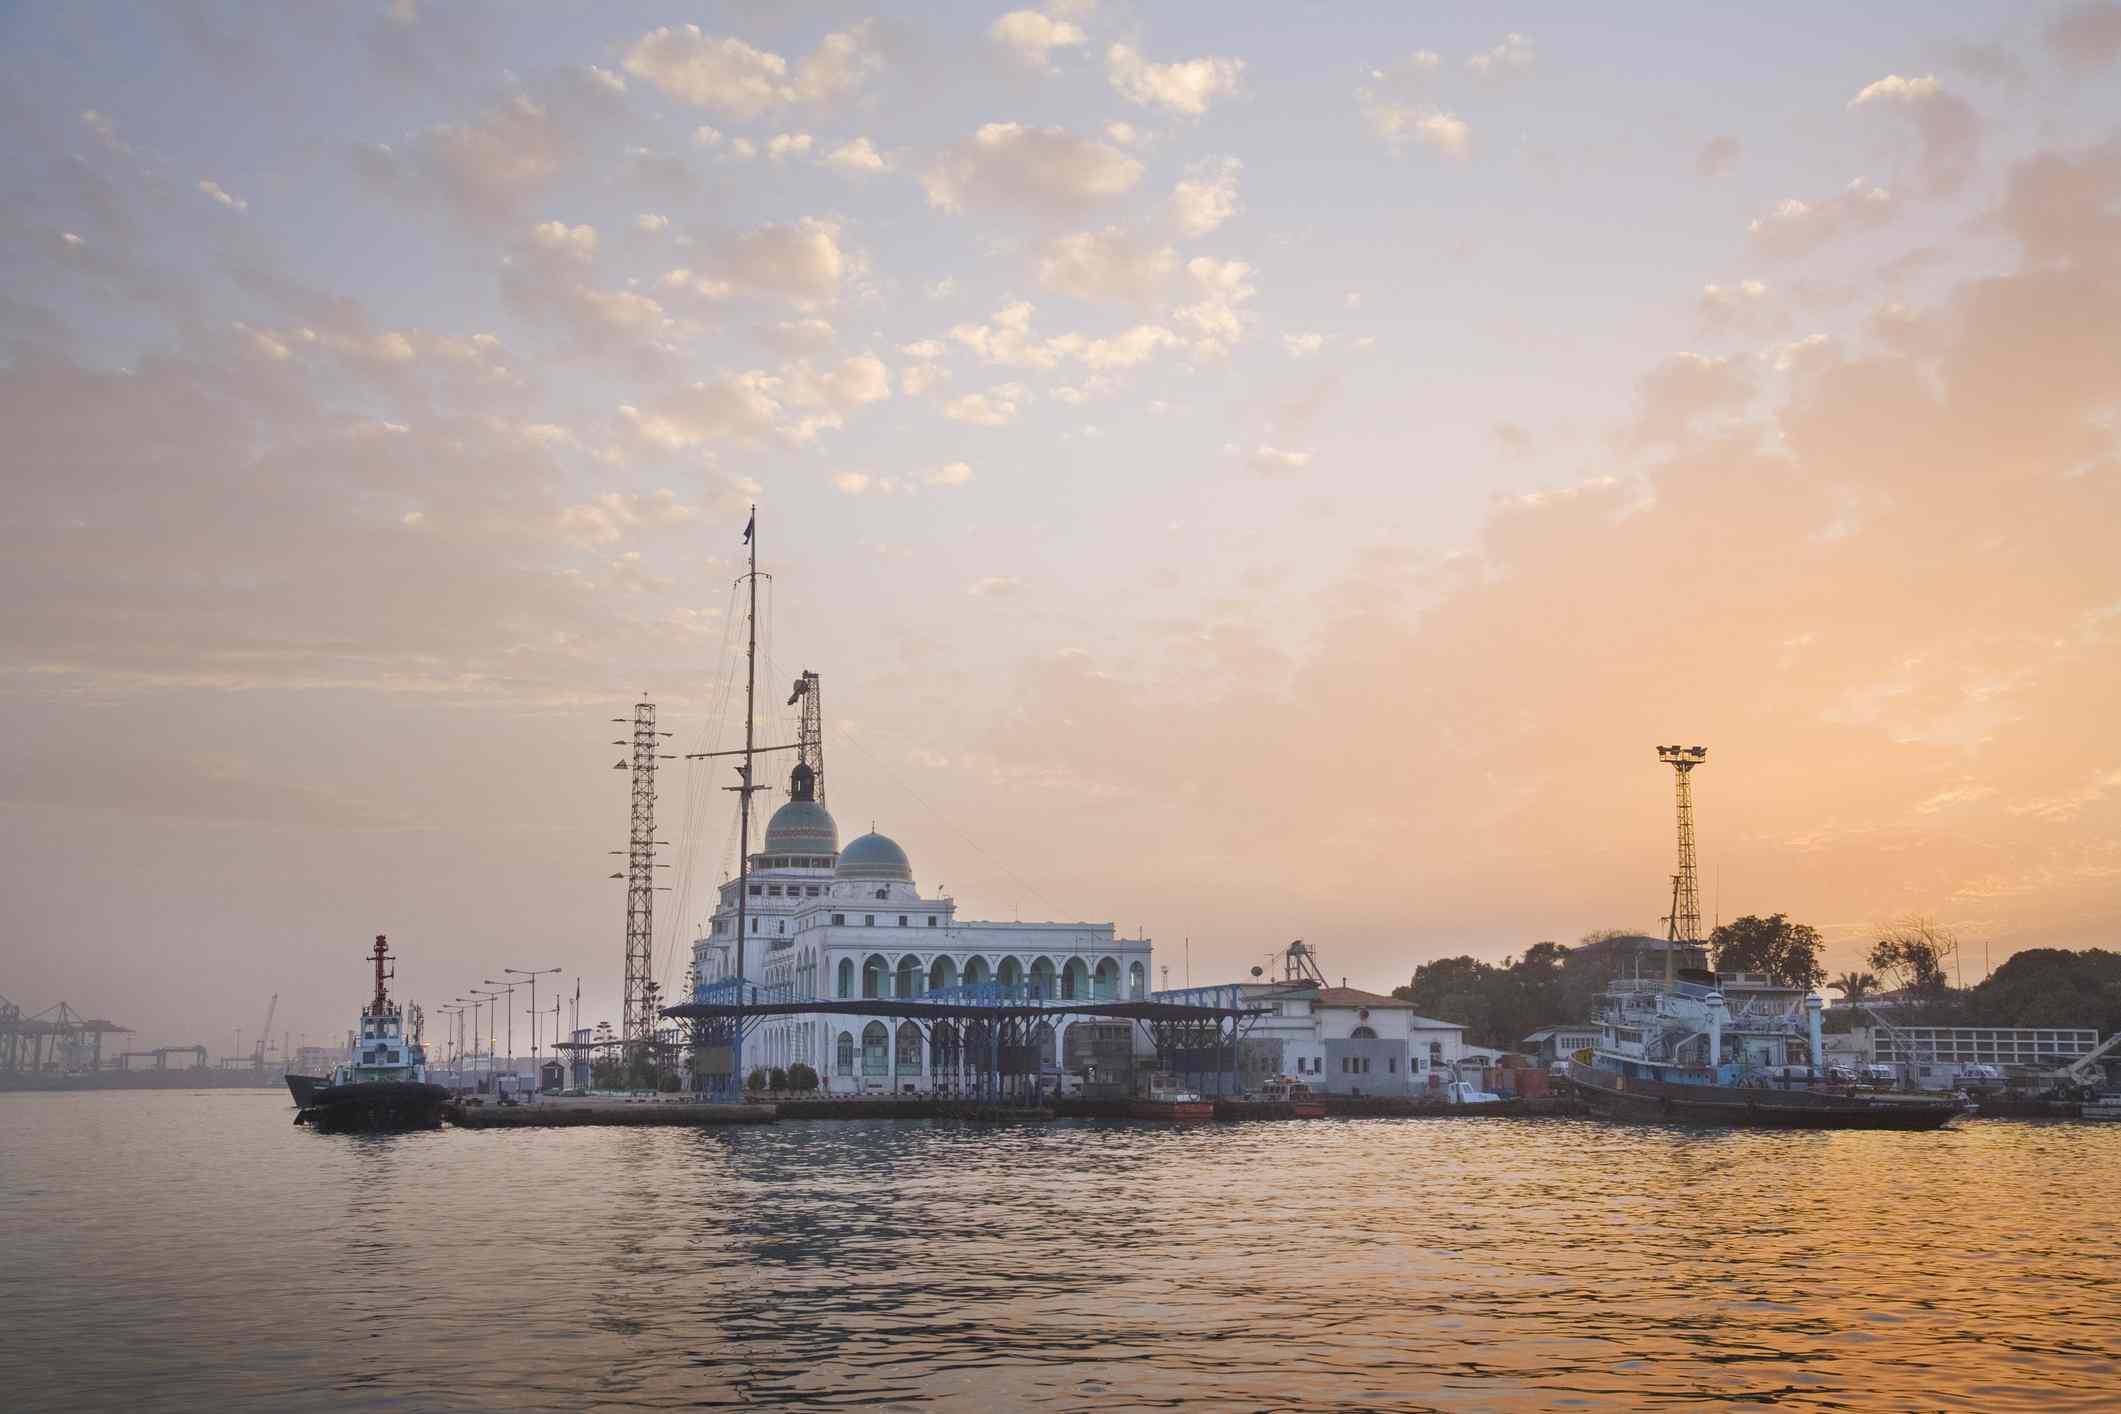 Port Said waterfront, Egypt